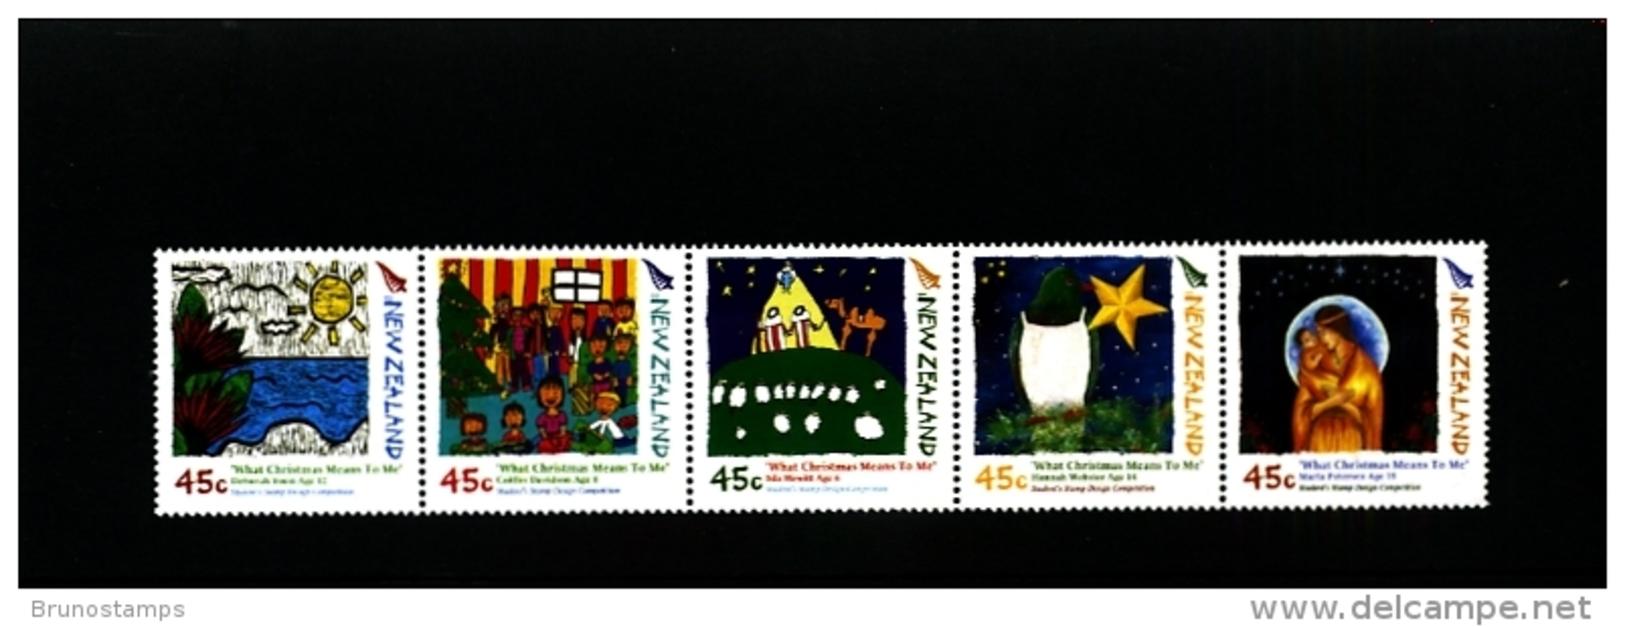 NEW ZEALAND - 2006  CHRISTMAS  STRIP  MINT NH - Blocchi & Foglietti